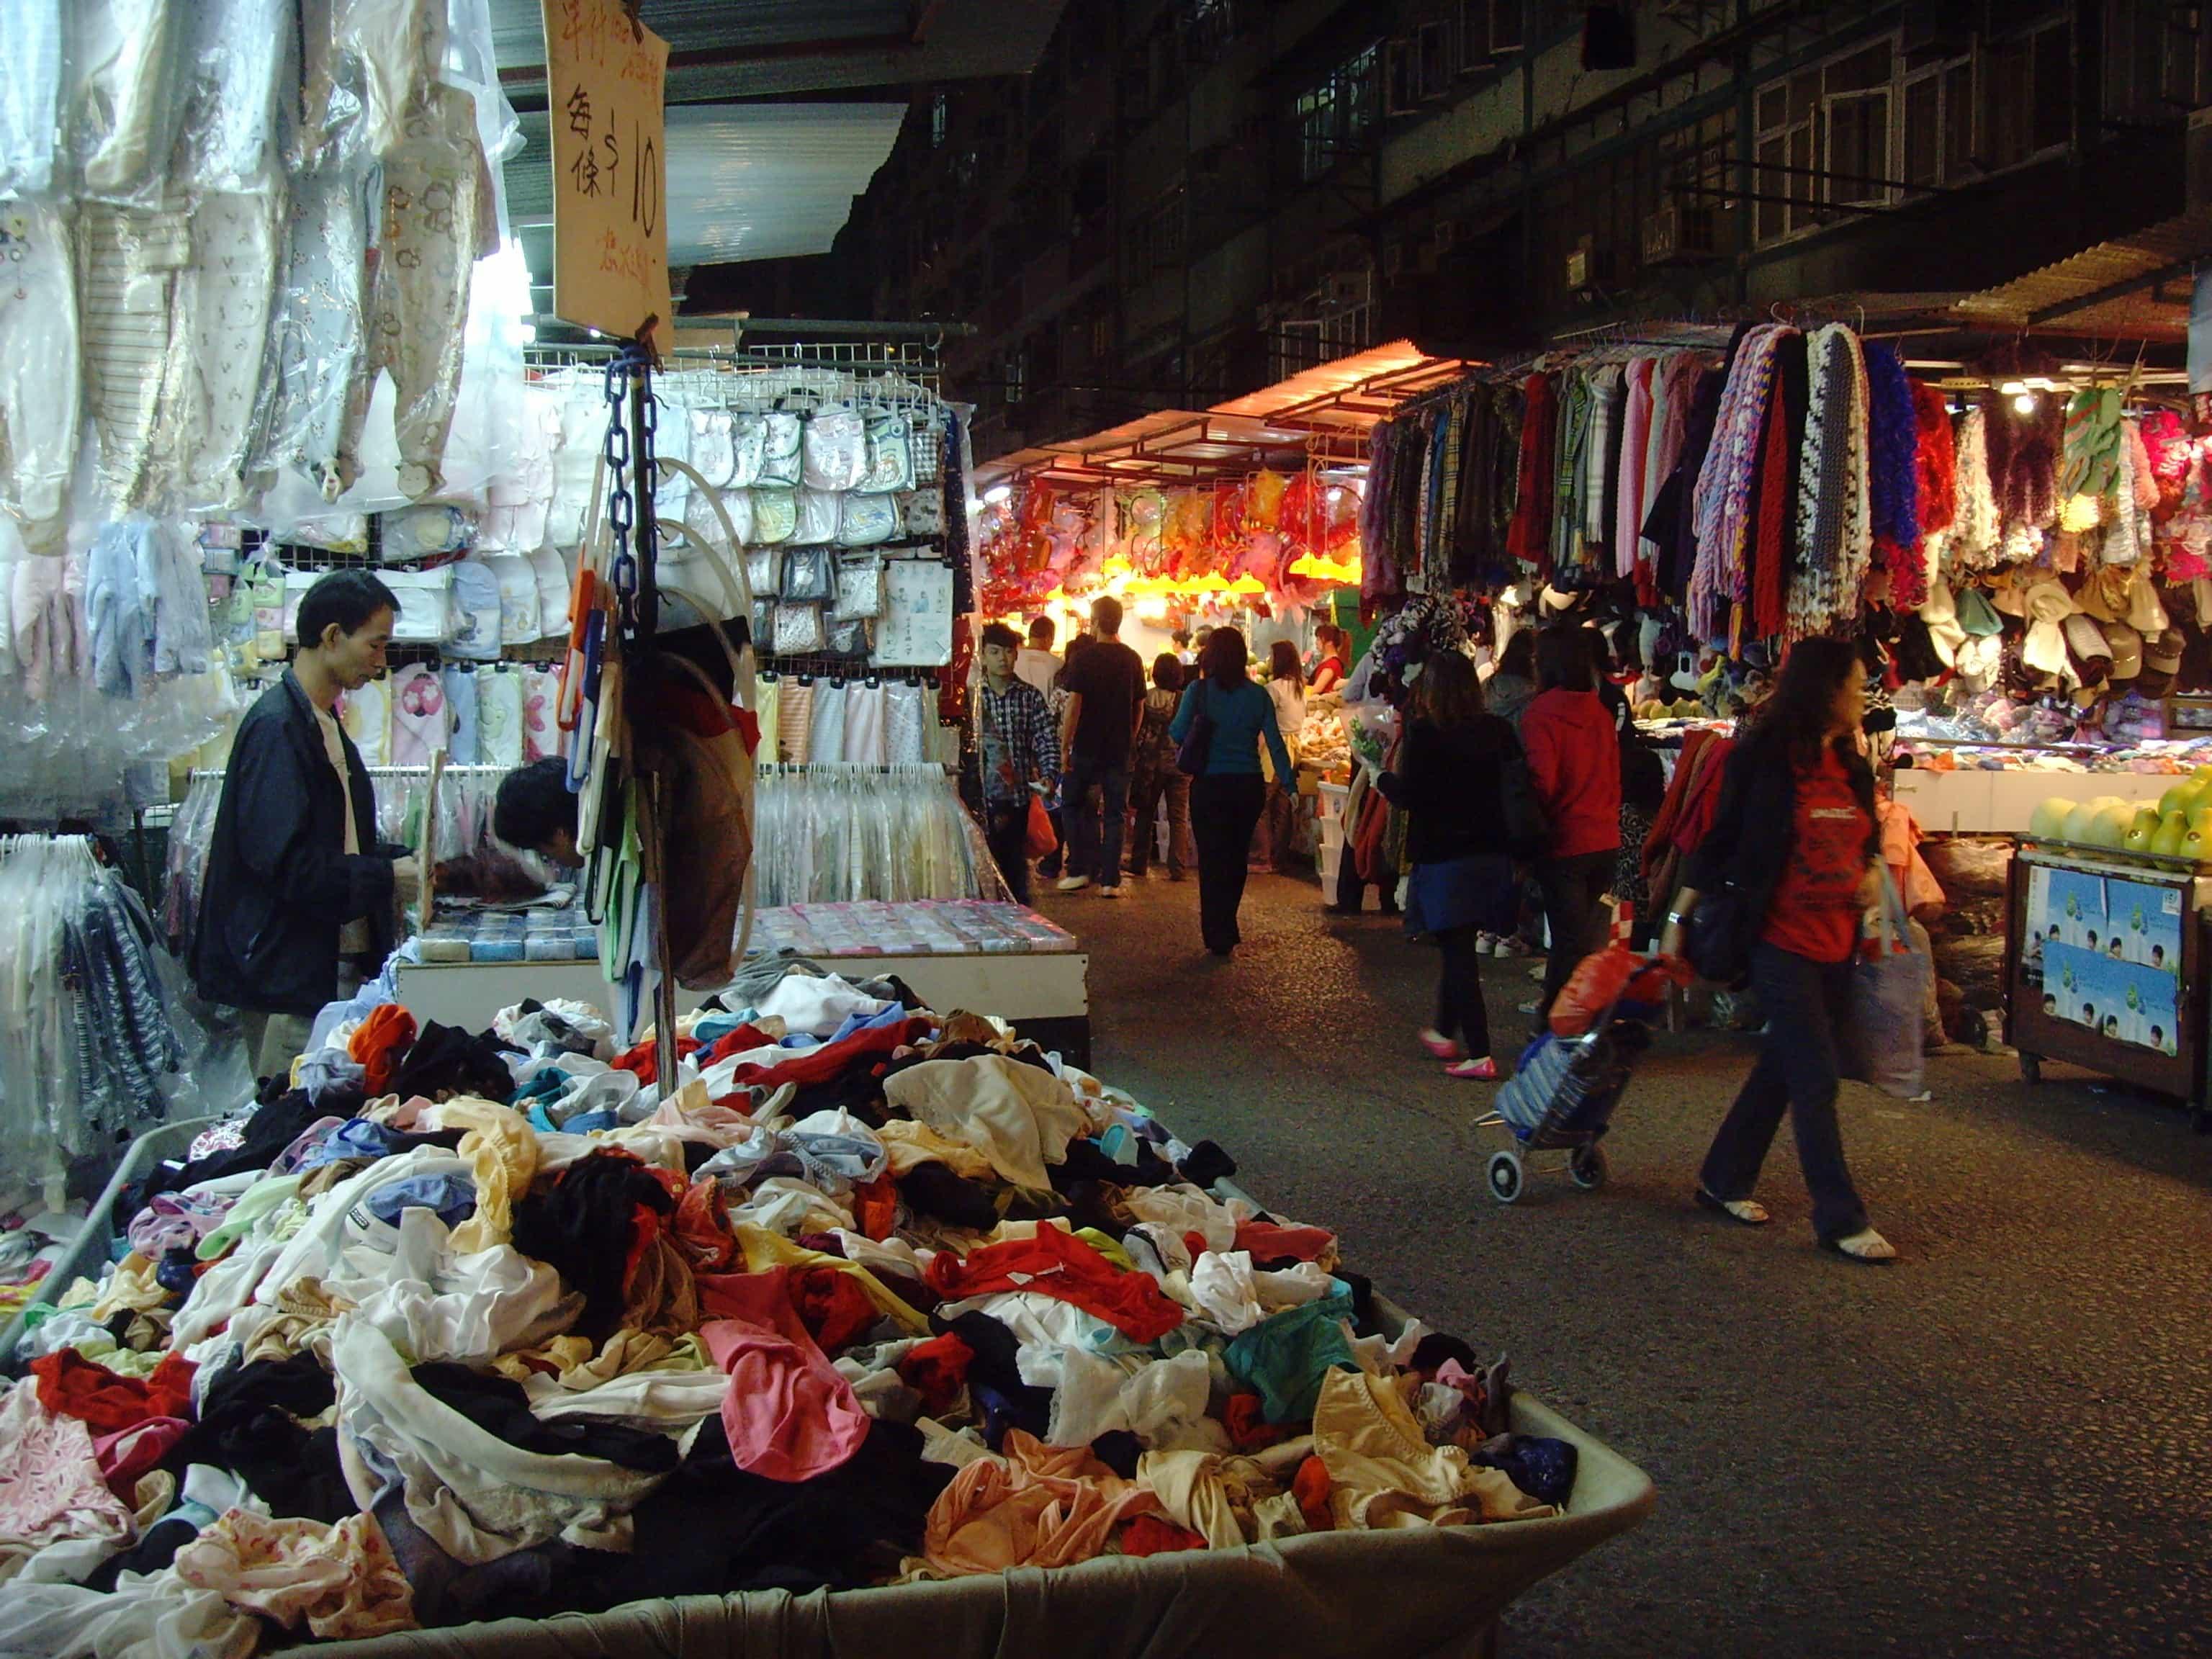 Ladie's Market, Hong Kong tourist spots